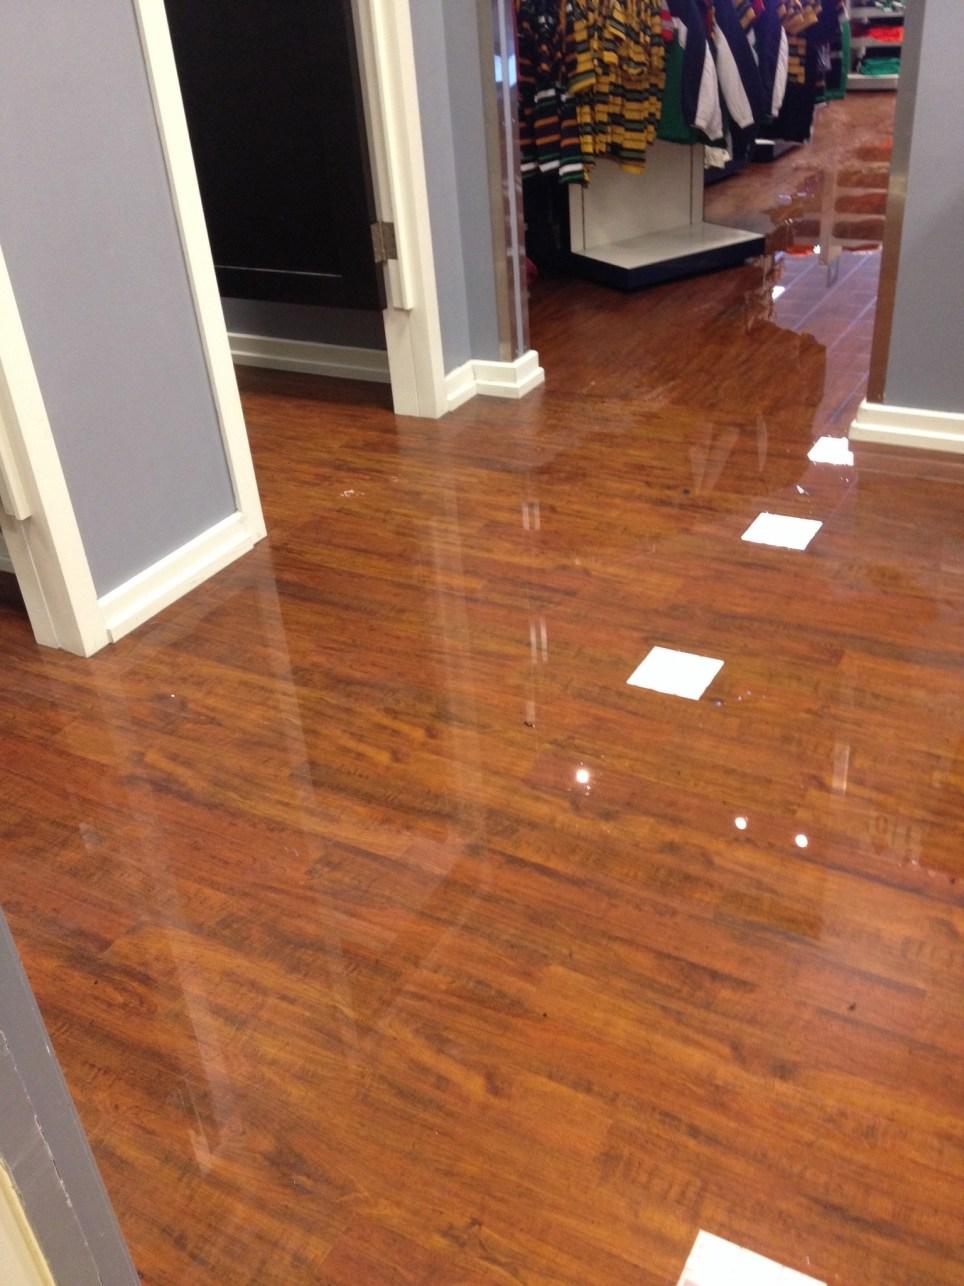 Retail store water leak